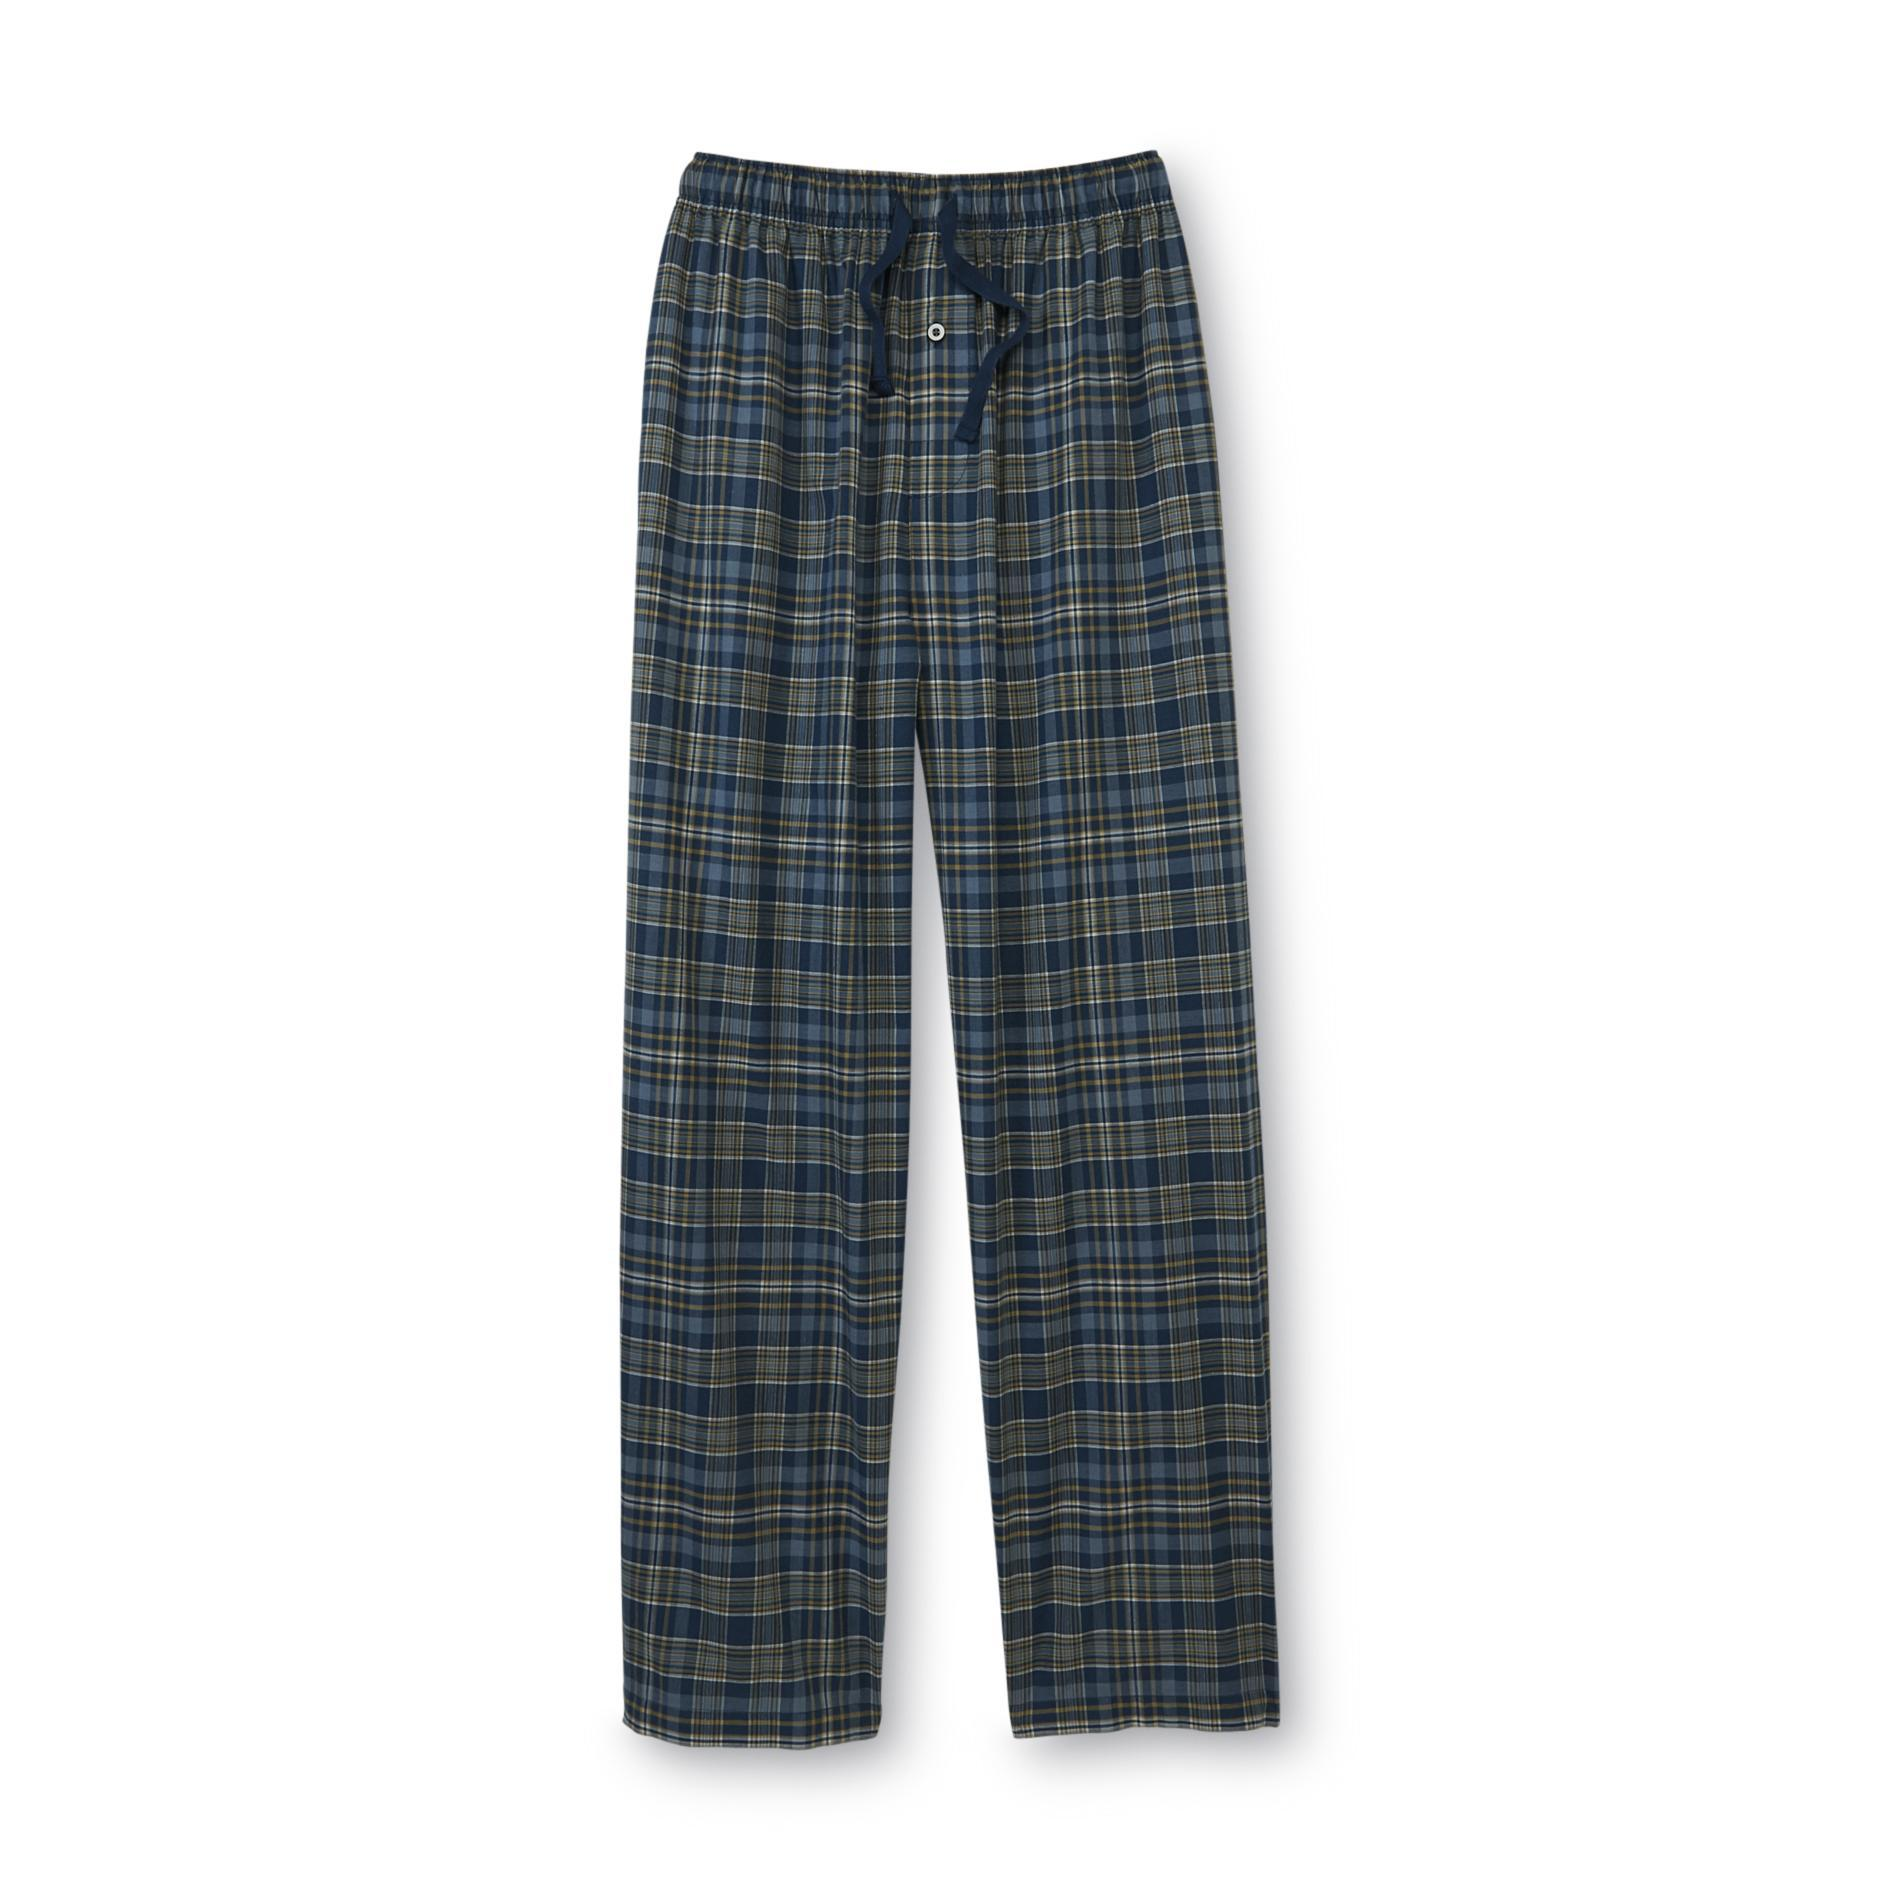 Men's Big & Tall Pajama Pants - Plaid